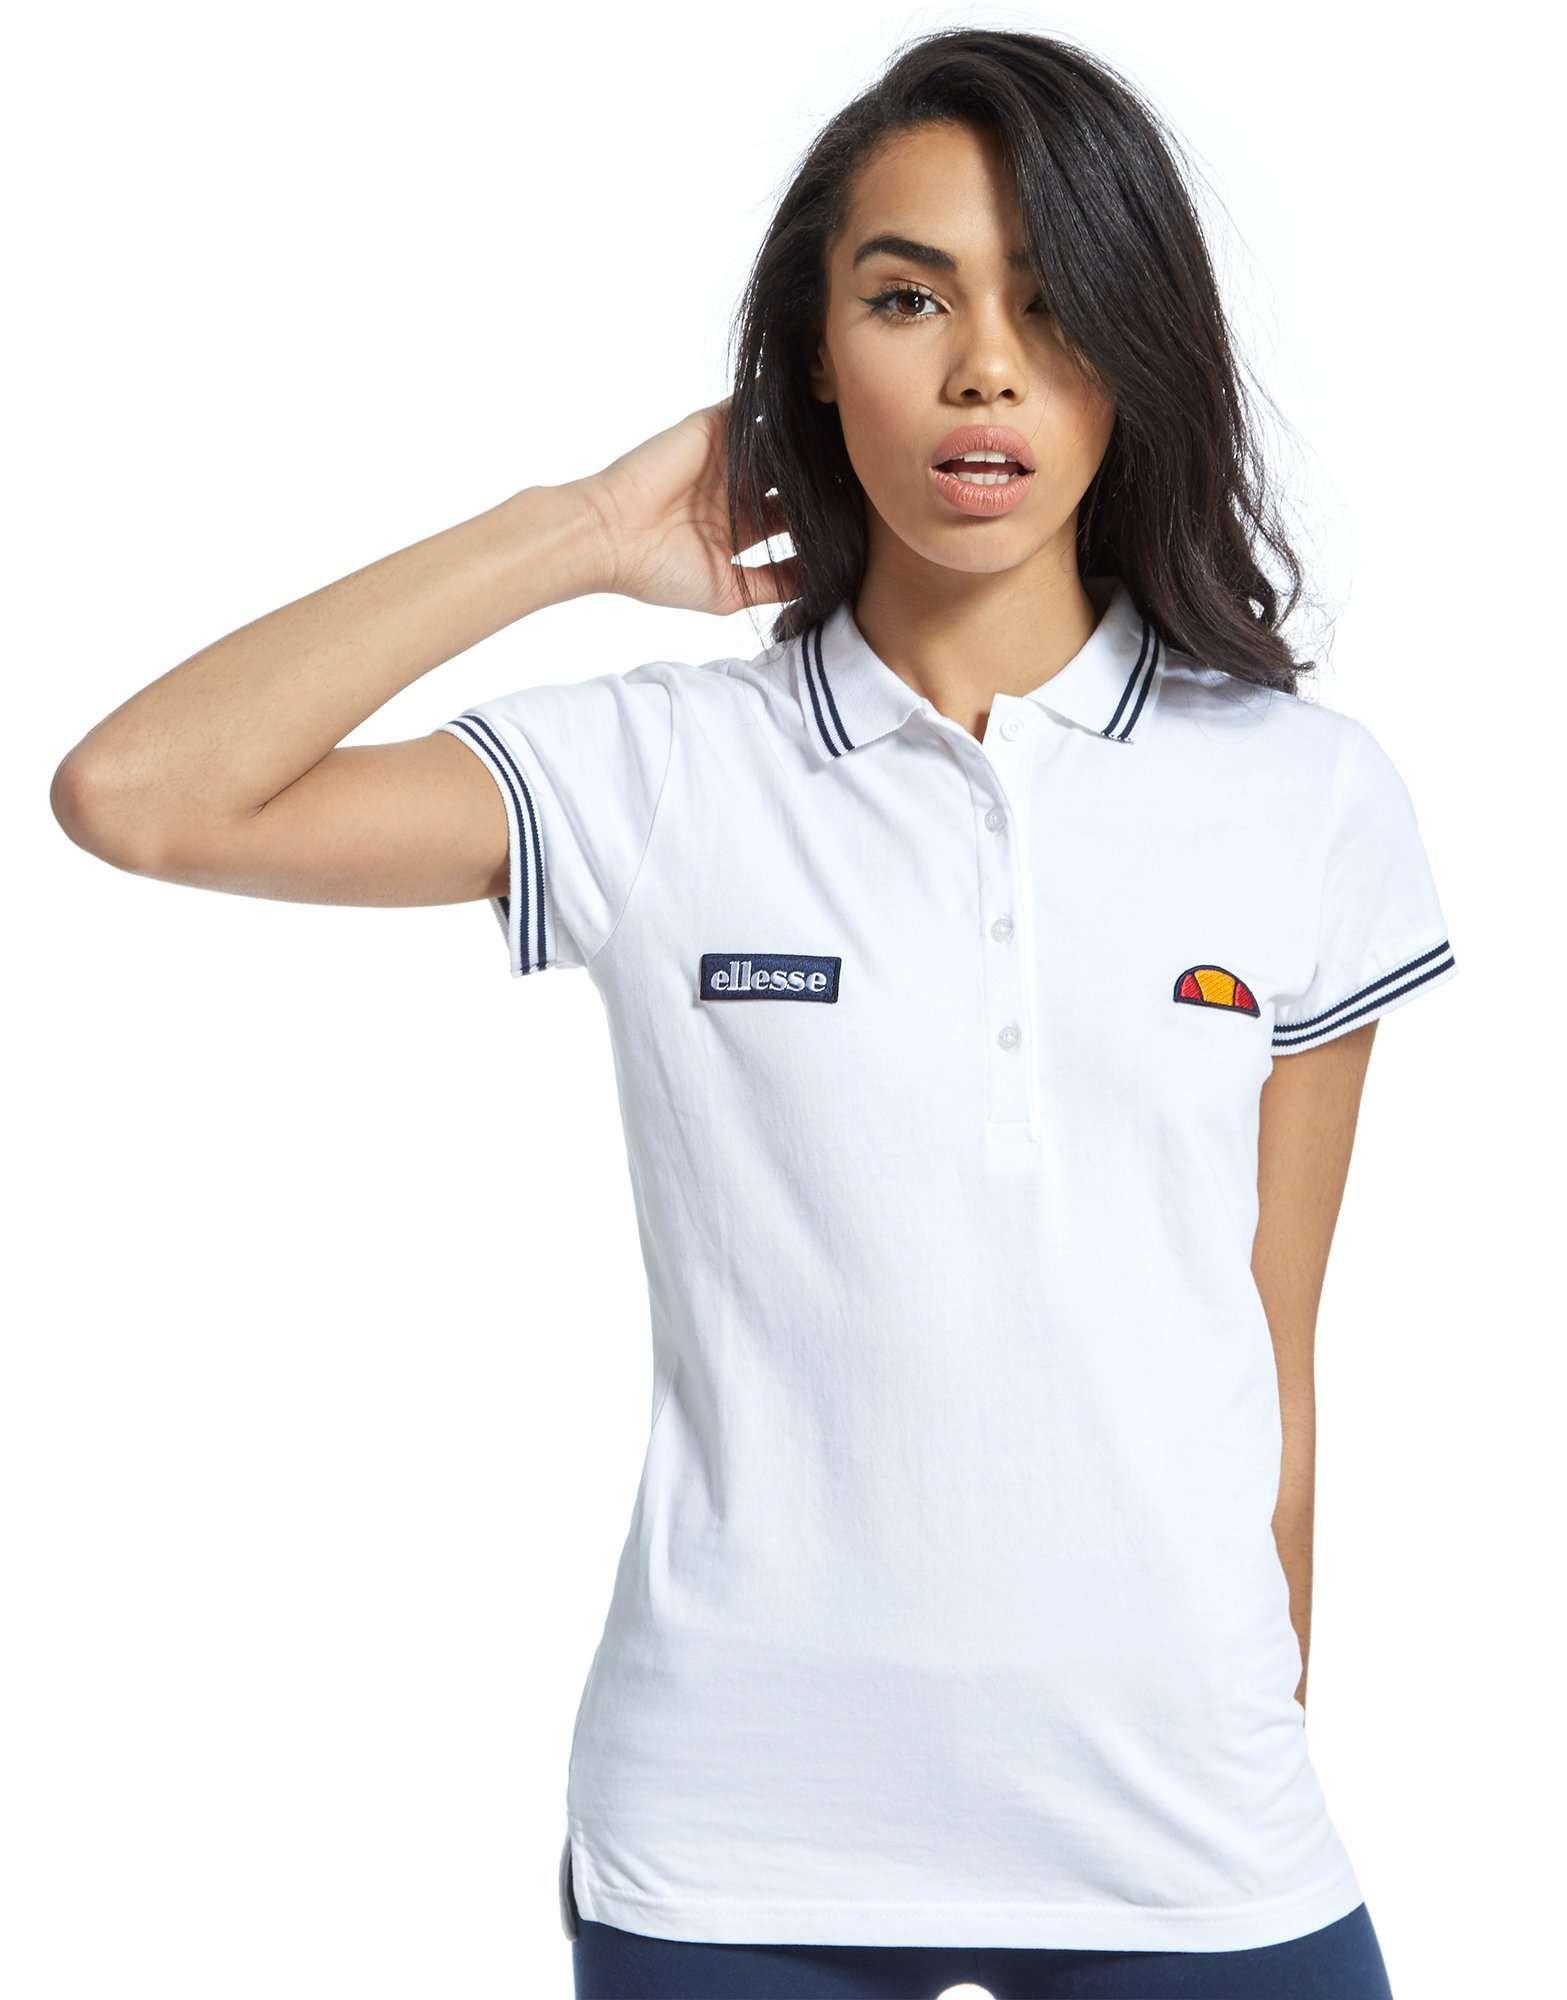 Ellesse t shirt white womens - White Pol T Shirt